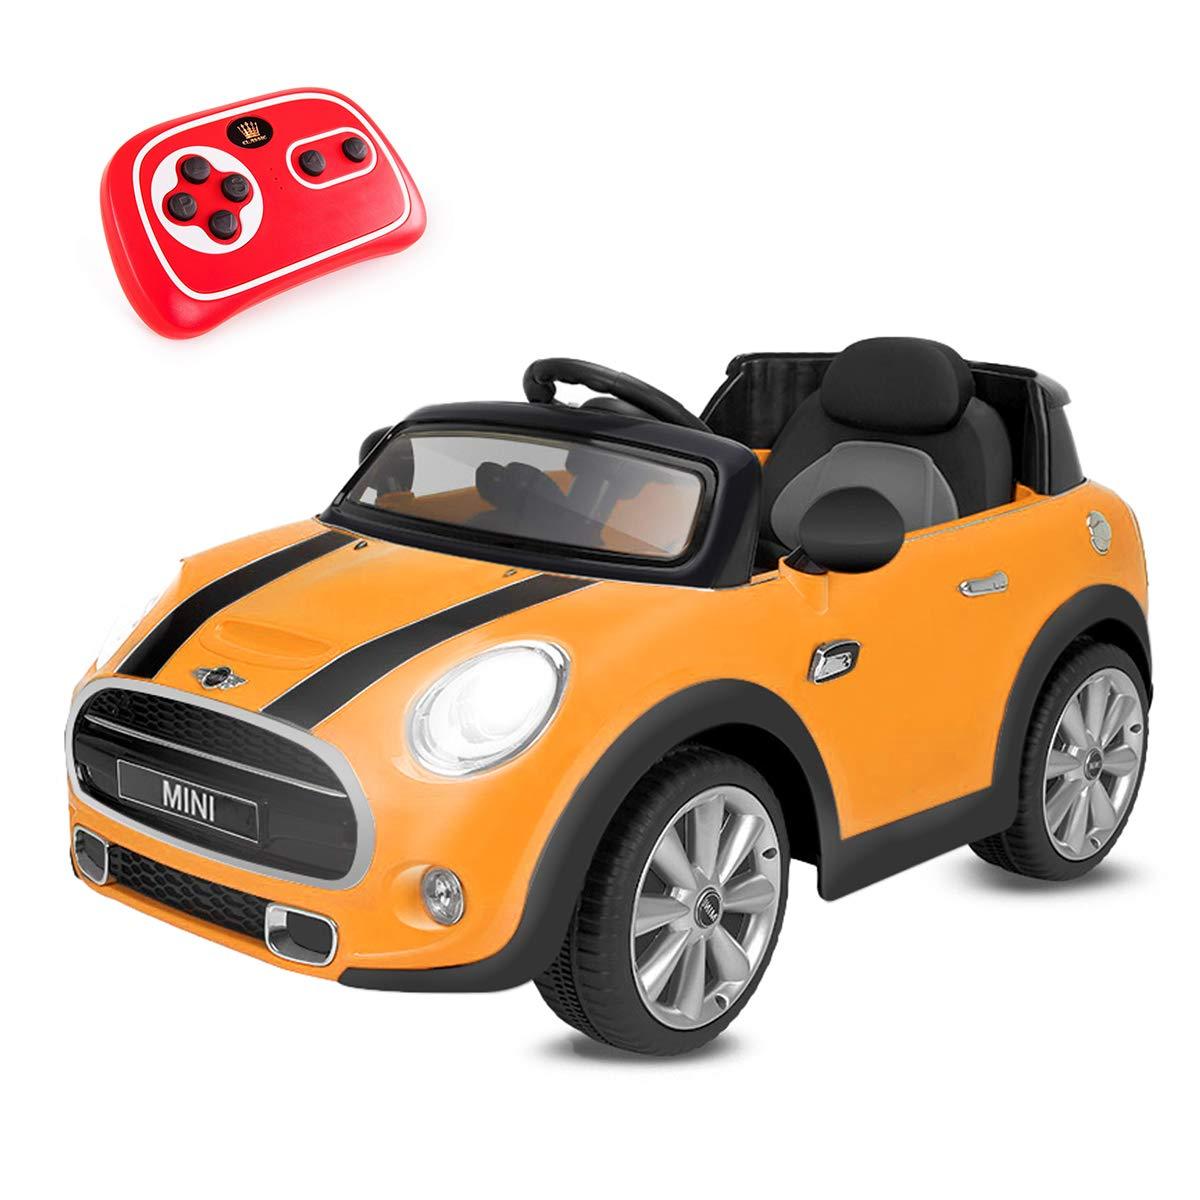 Playkin Coche Electrico Electrico Coche Ninos Mini Hatch Color